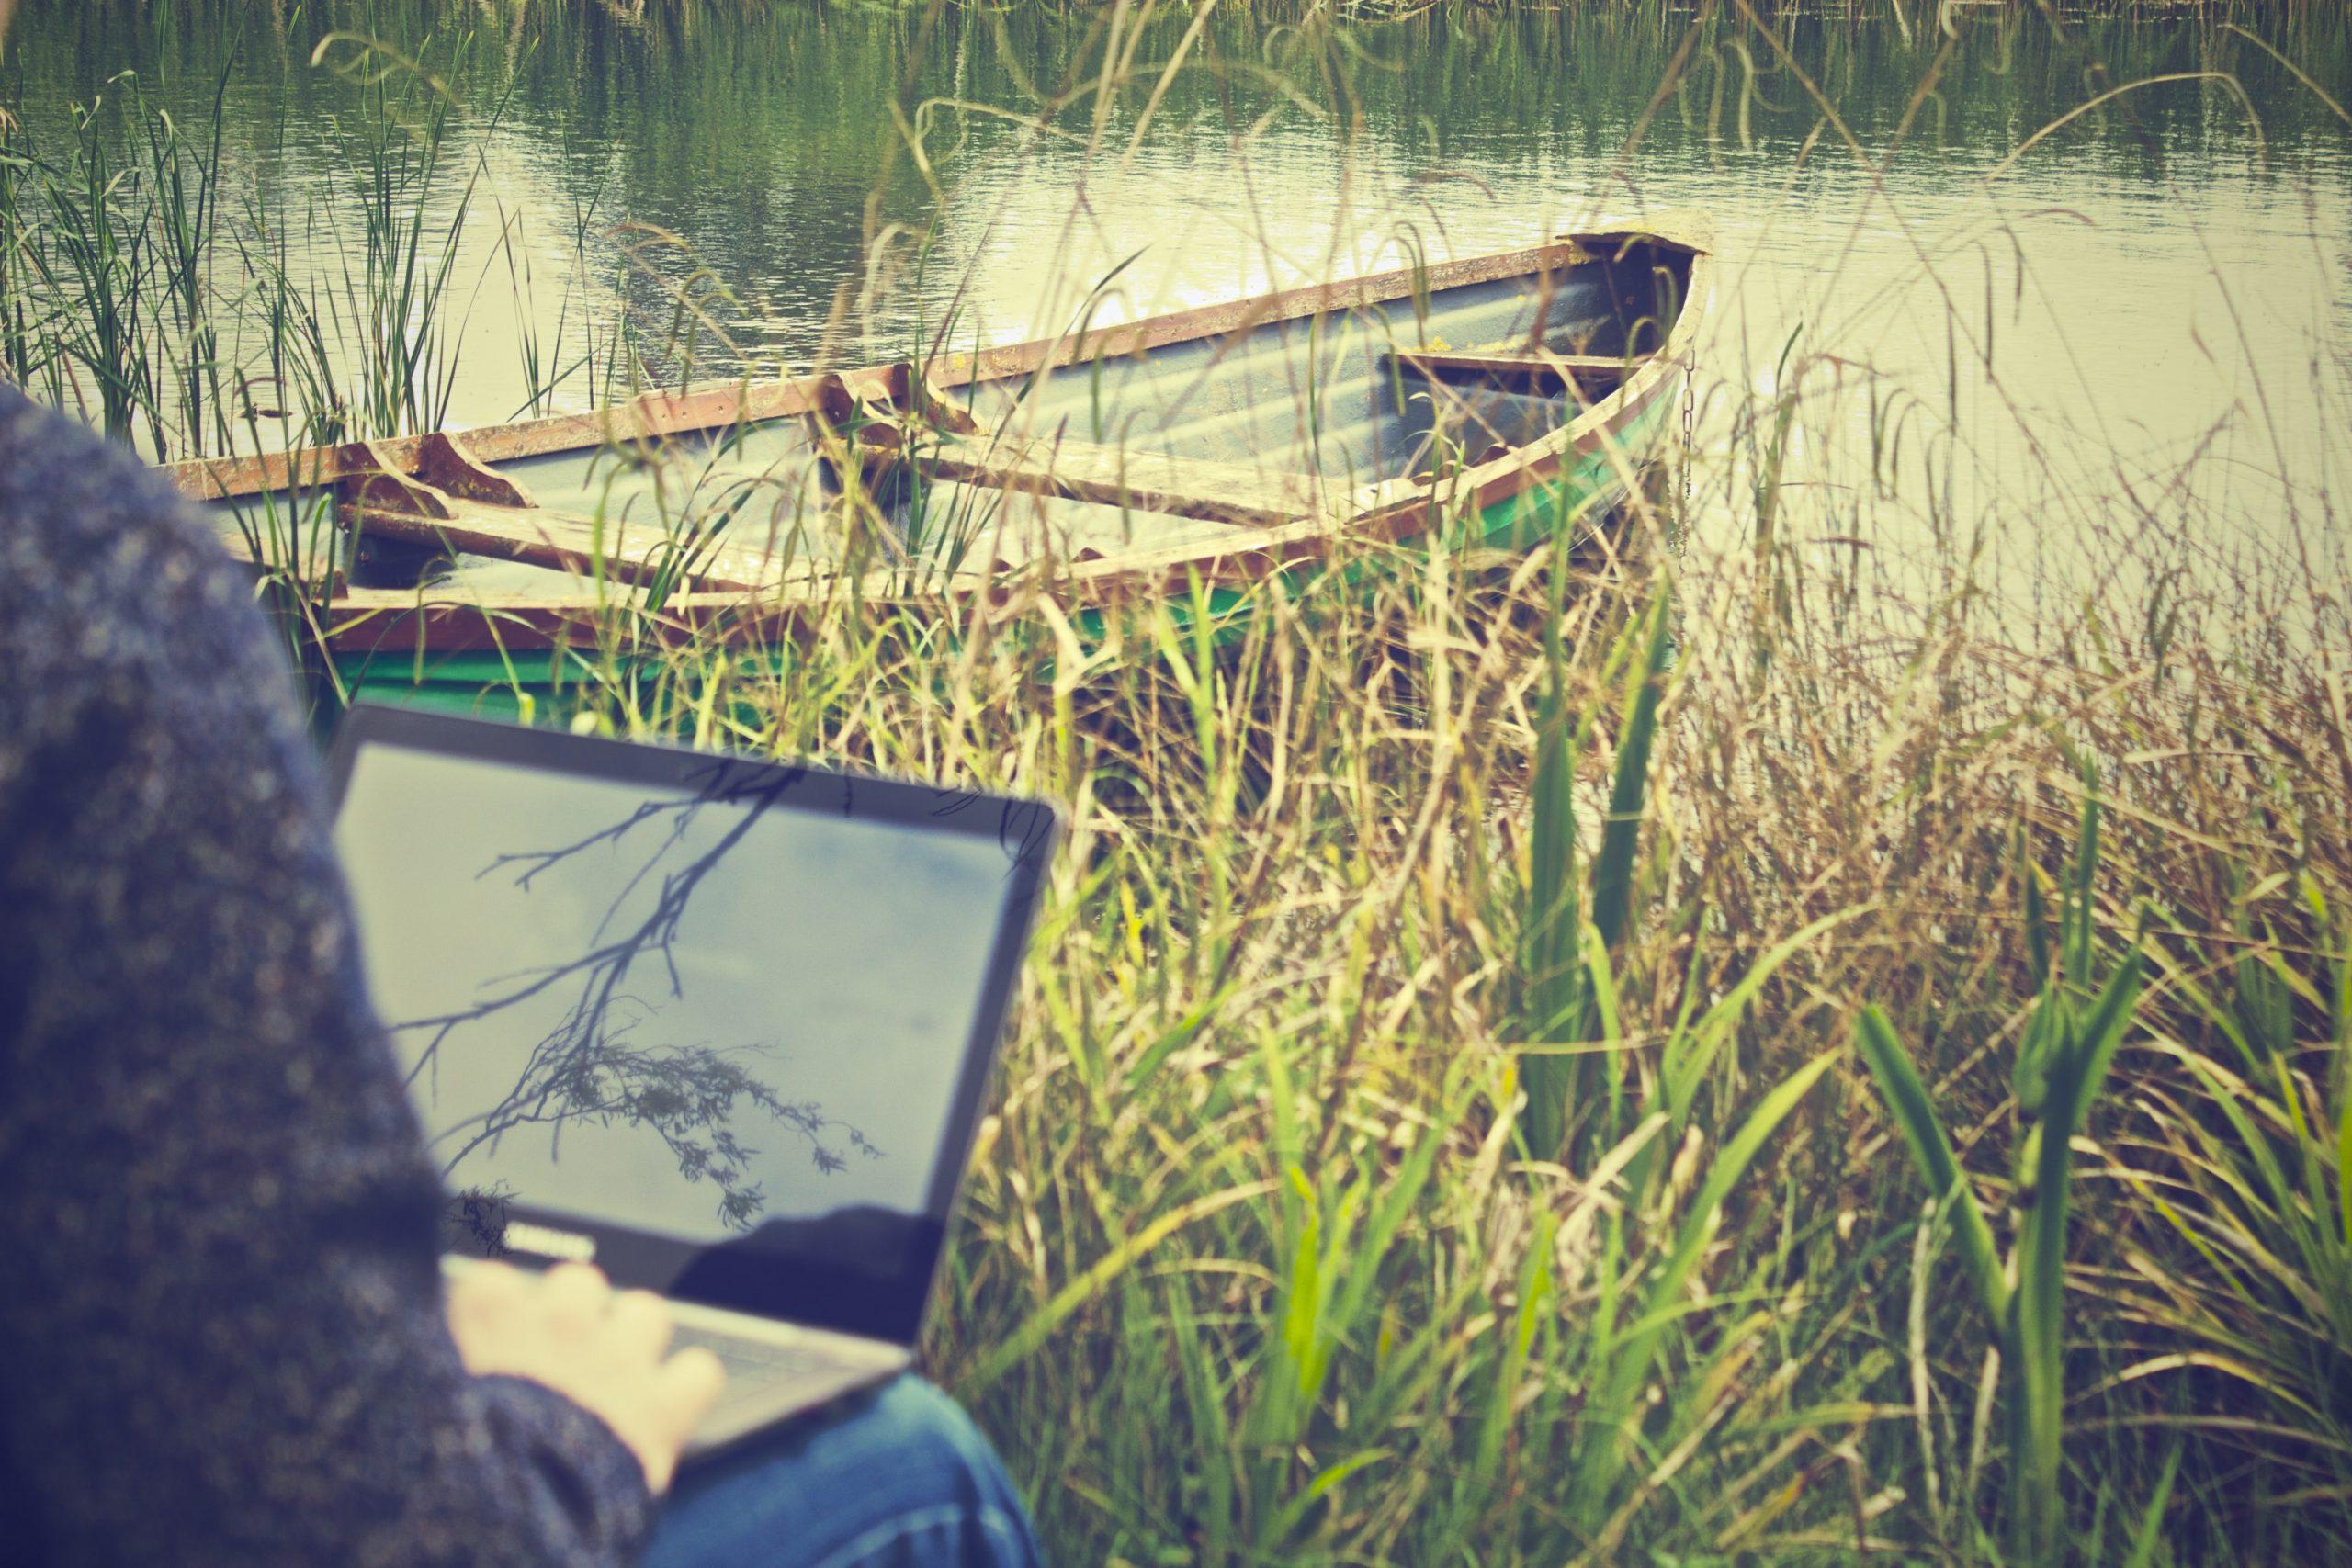 digital nomad laptop mockup 4778 scaled - Les globe blogueurs - blog voyage nature